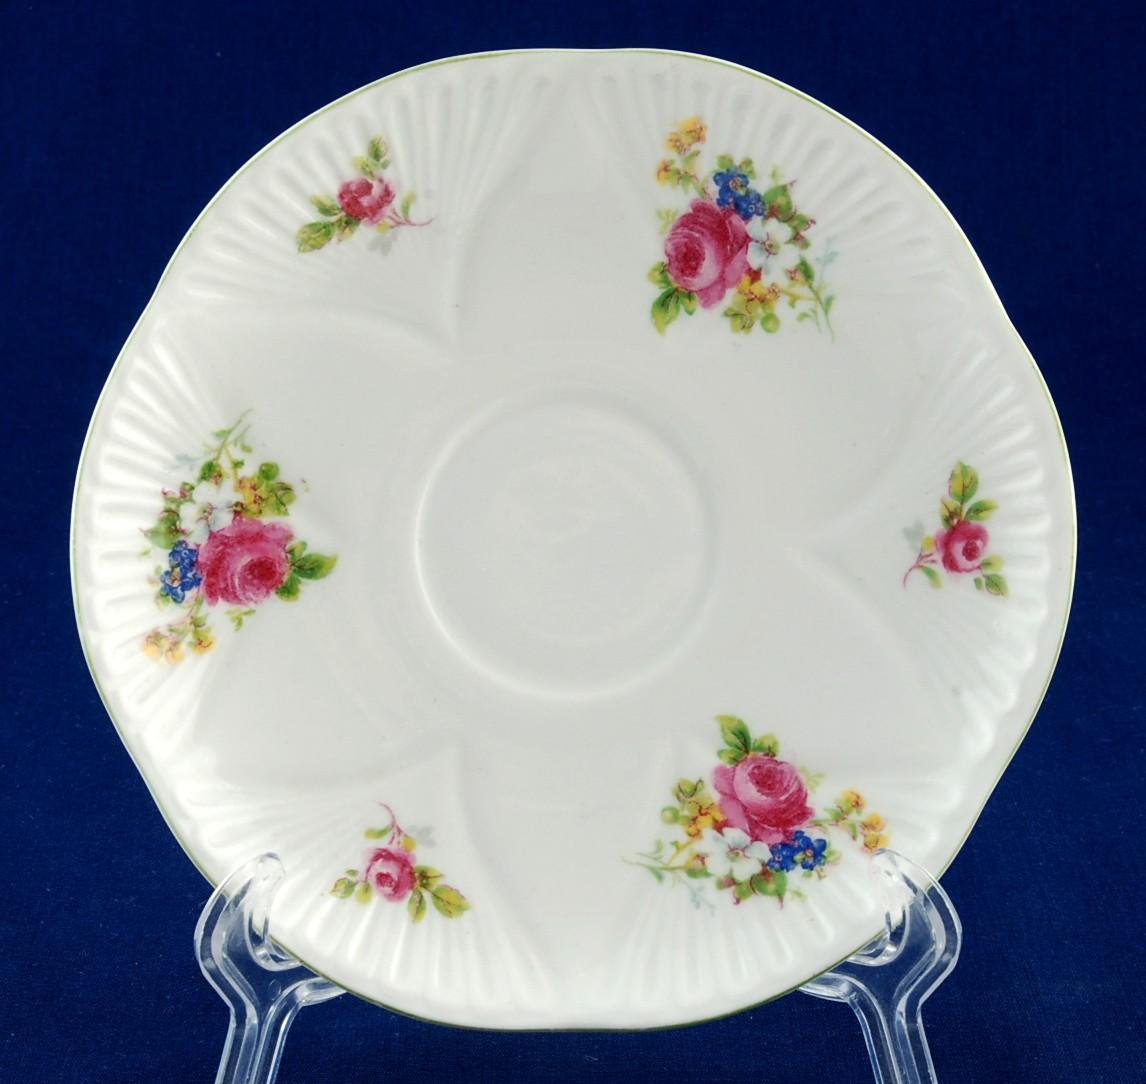 Shelley hulmes rose dainty saucer